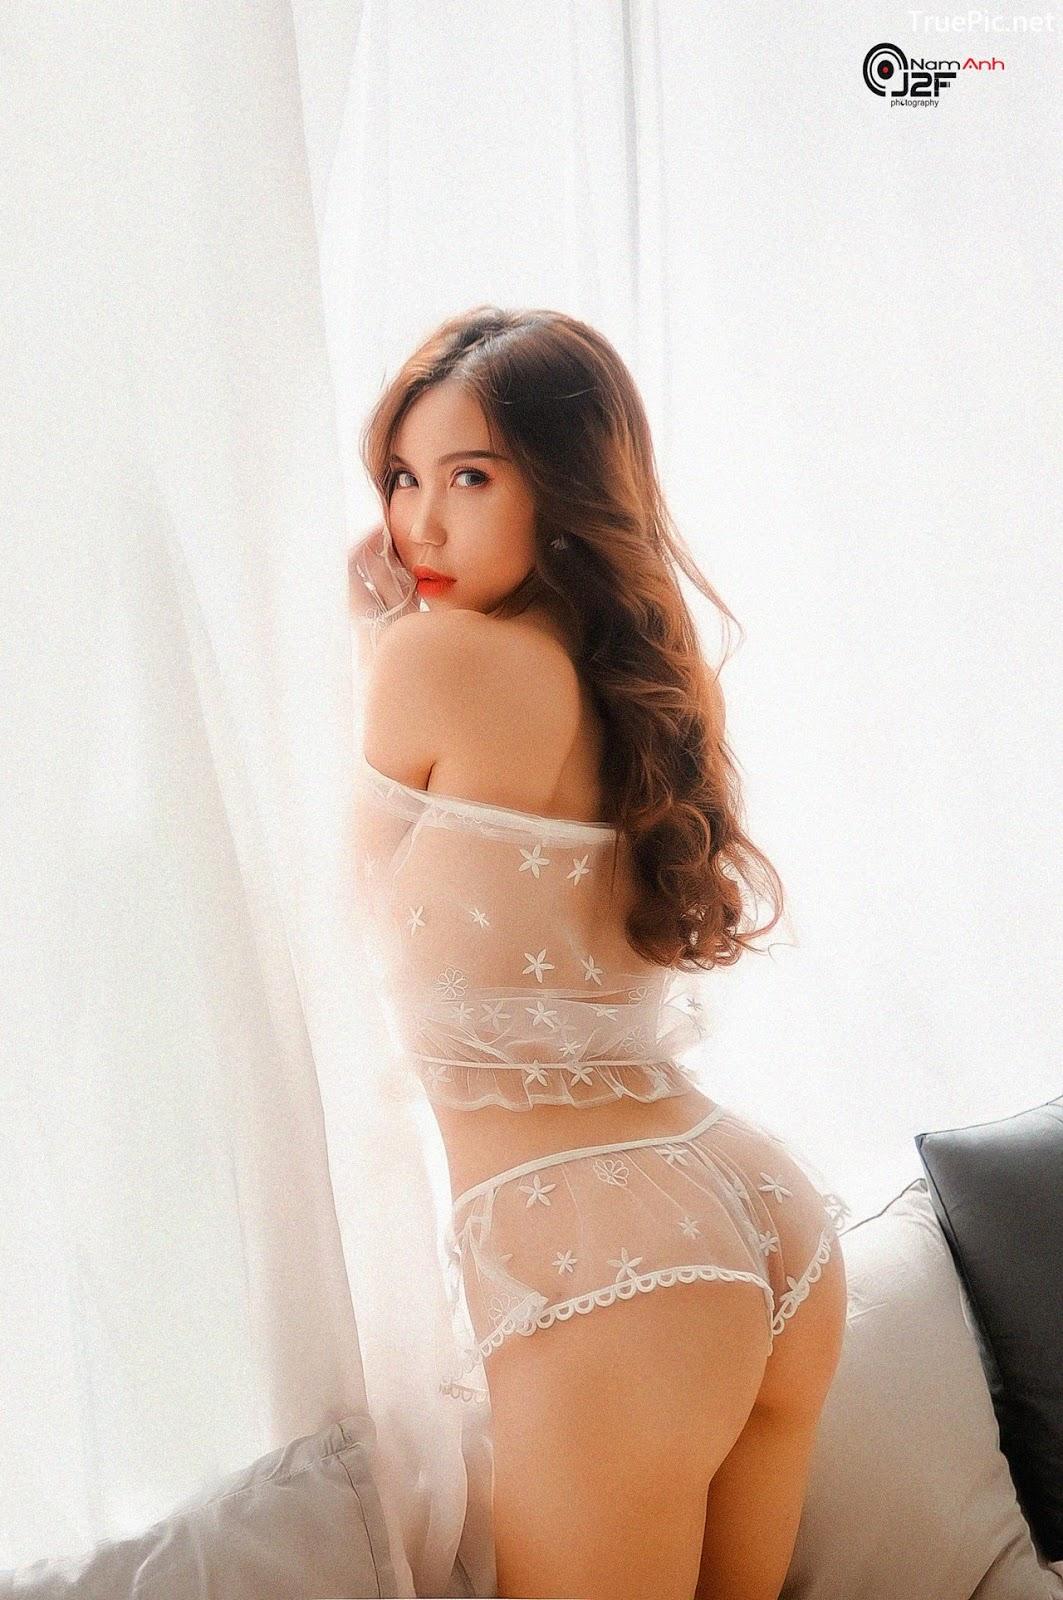 Image Vietnamese Model – Sexy Beauty of Beautiful Girls Taken by NamAnh Photo #8 - TruePic.net - Picture-3